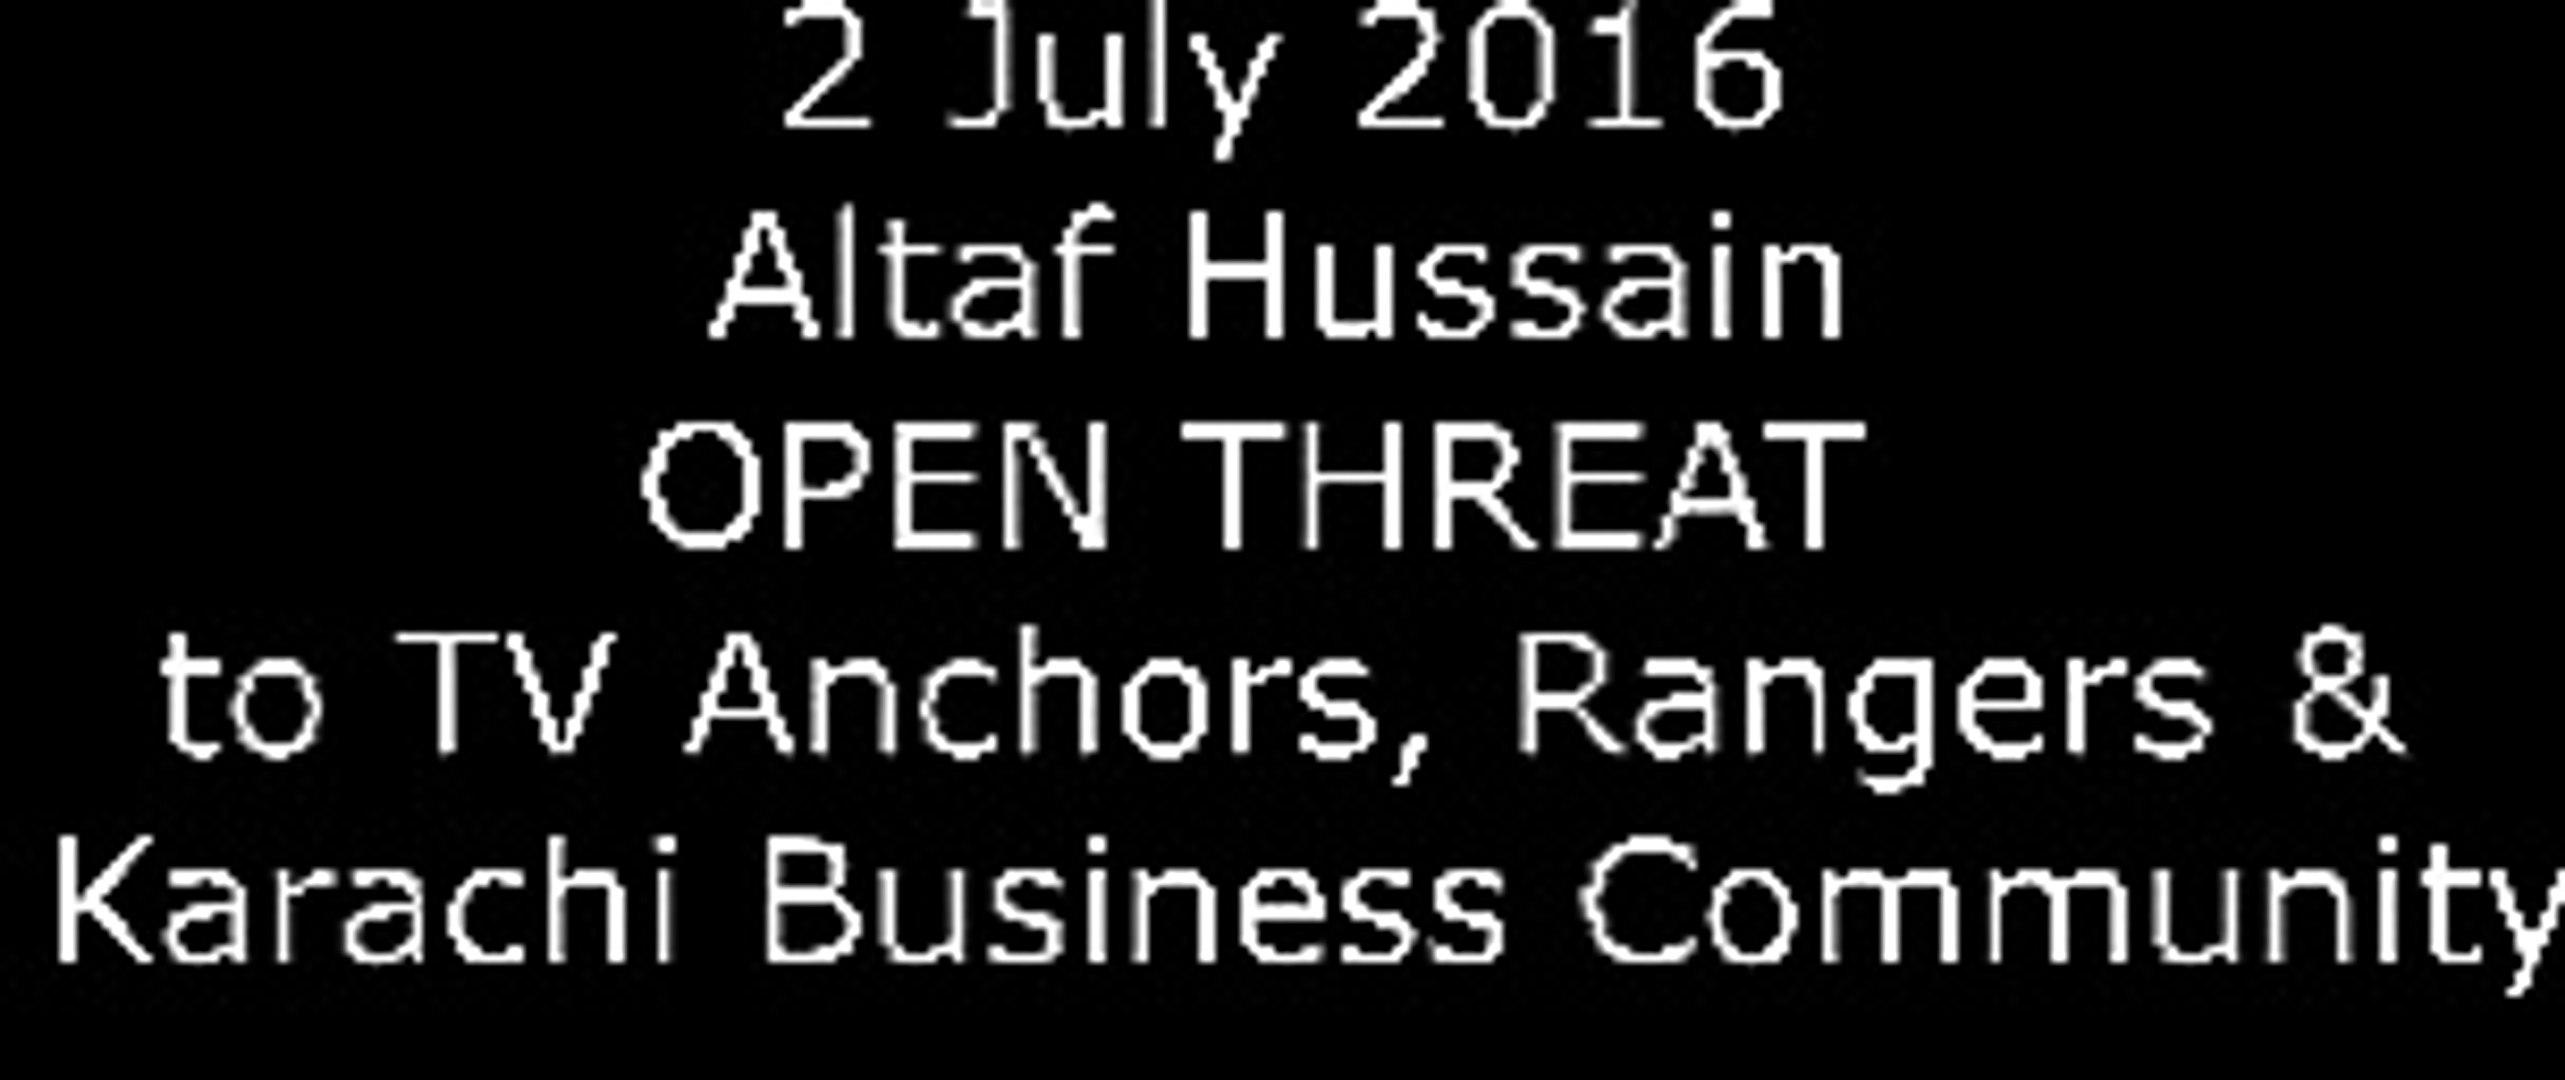 Altaf Hussain open Threat to TV Anchors & Karachi Business Community